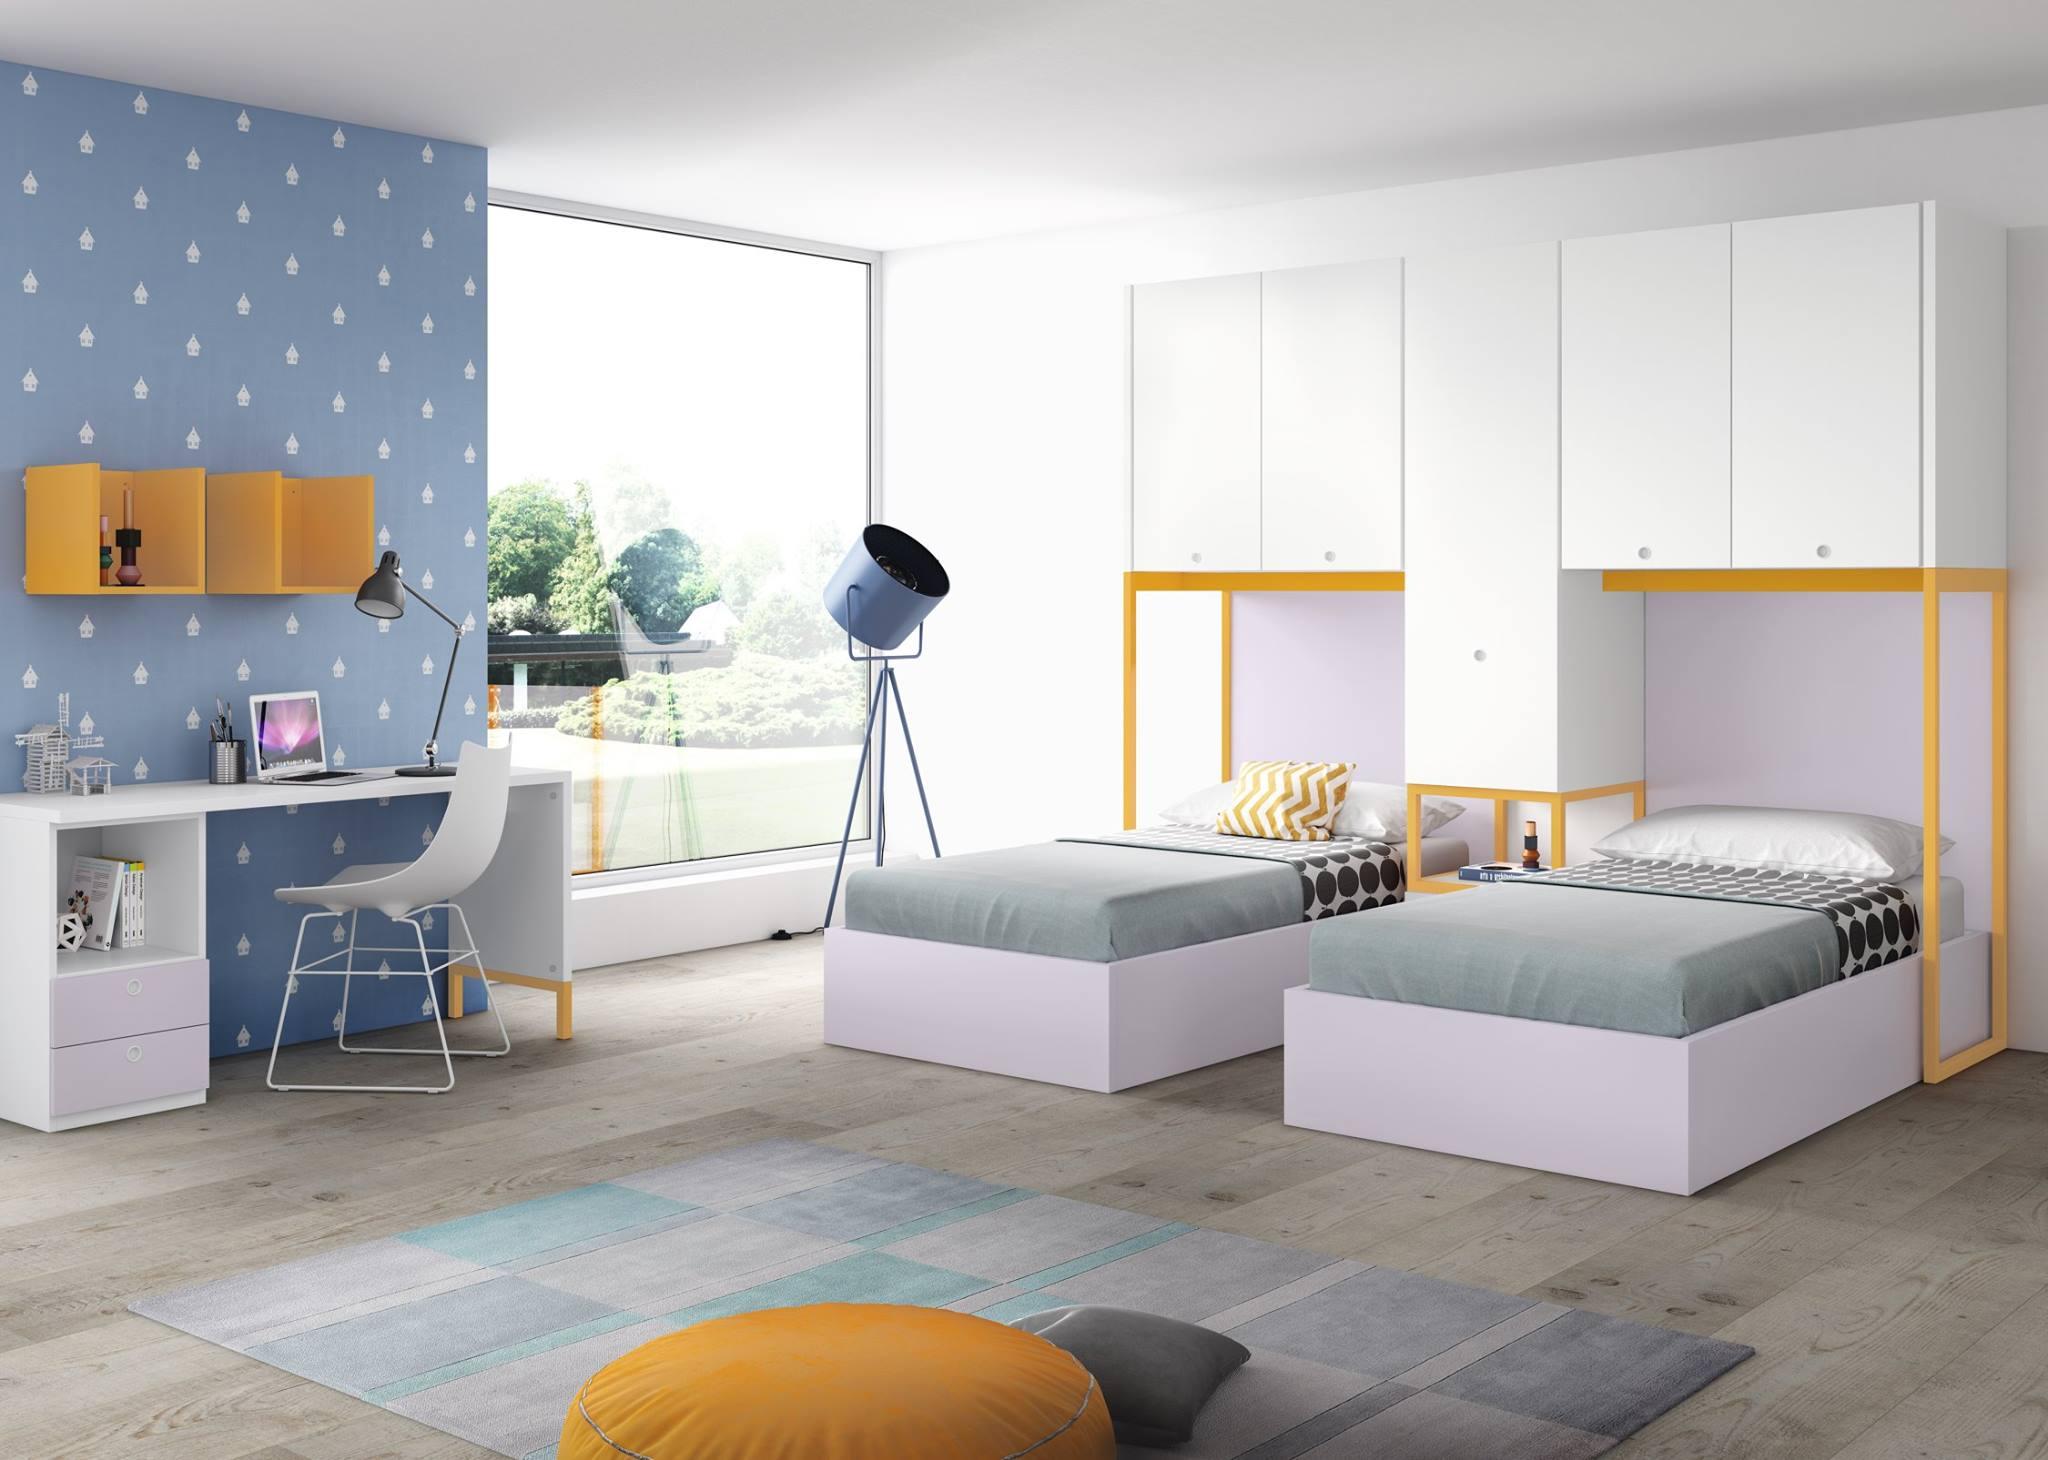 Muebles bidasoa en irun vende dormitorios de matrimonio - Muebles dormitorio moderno ...